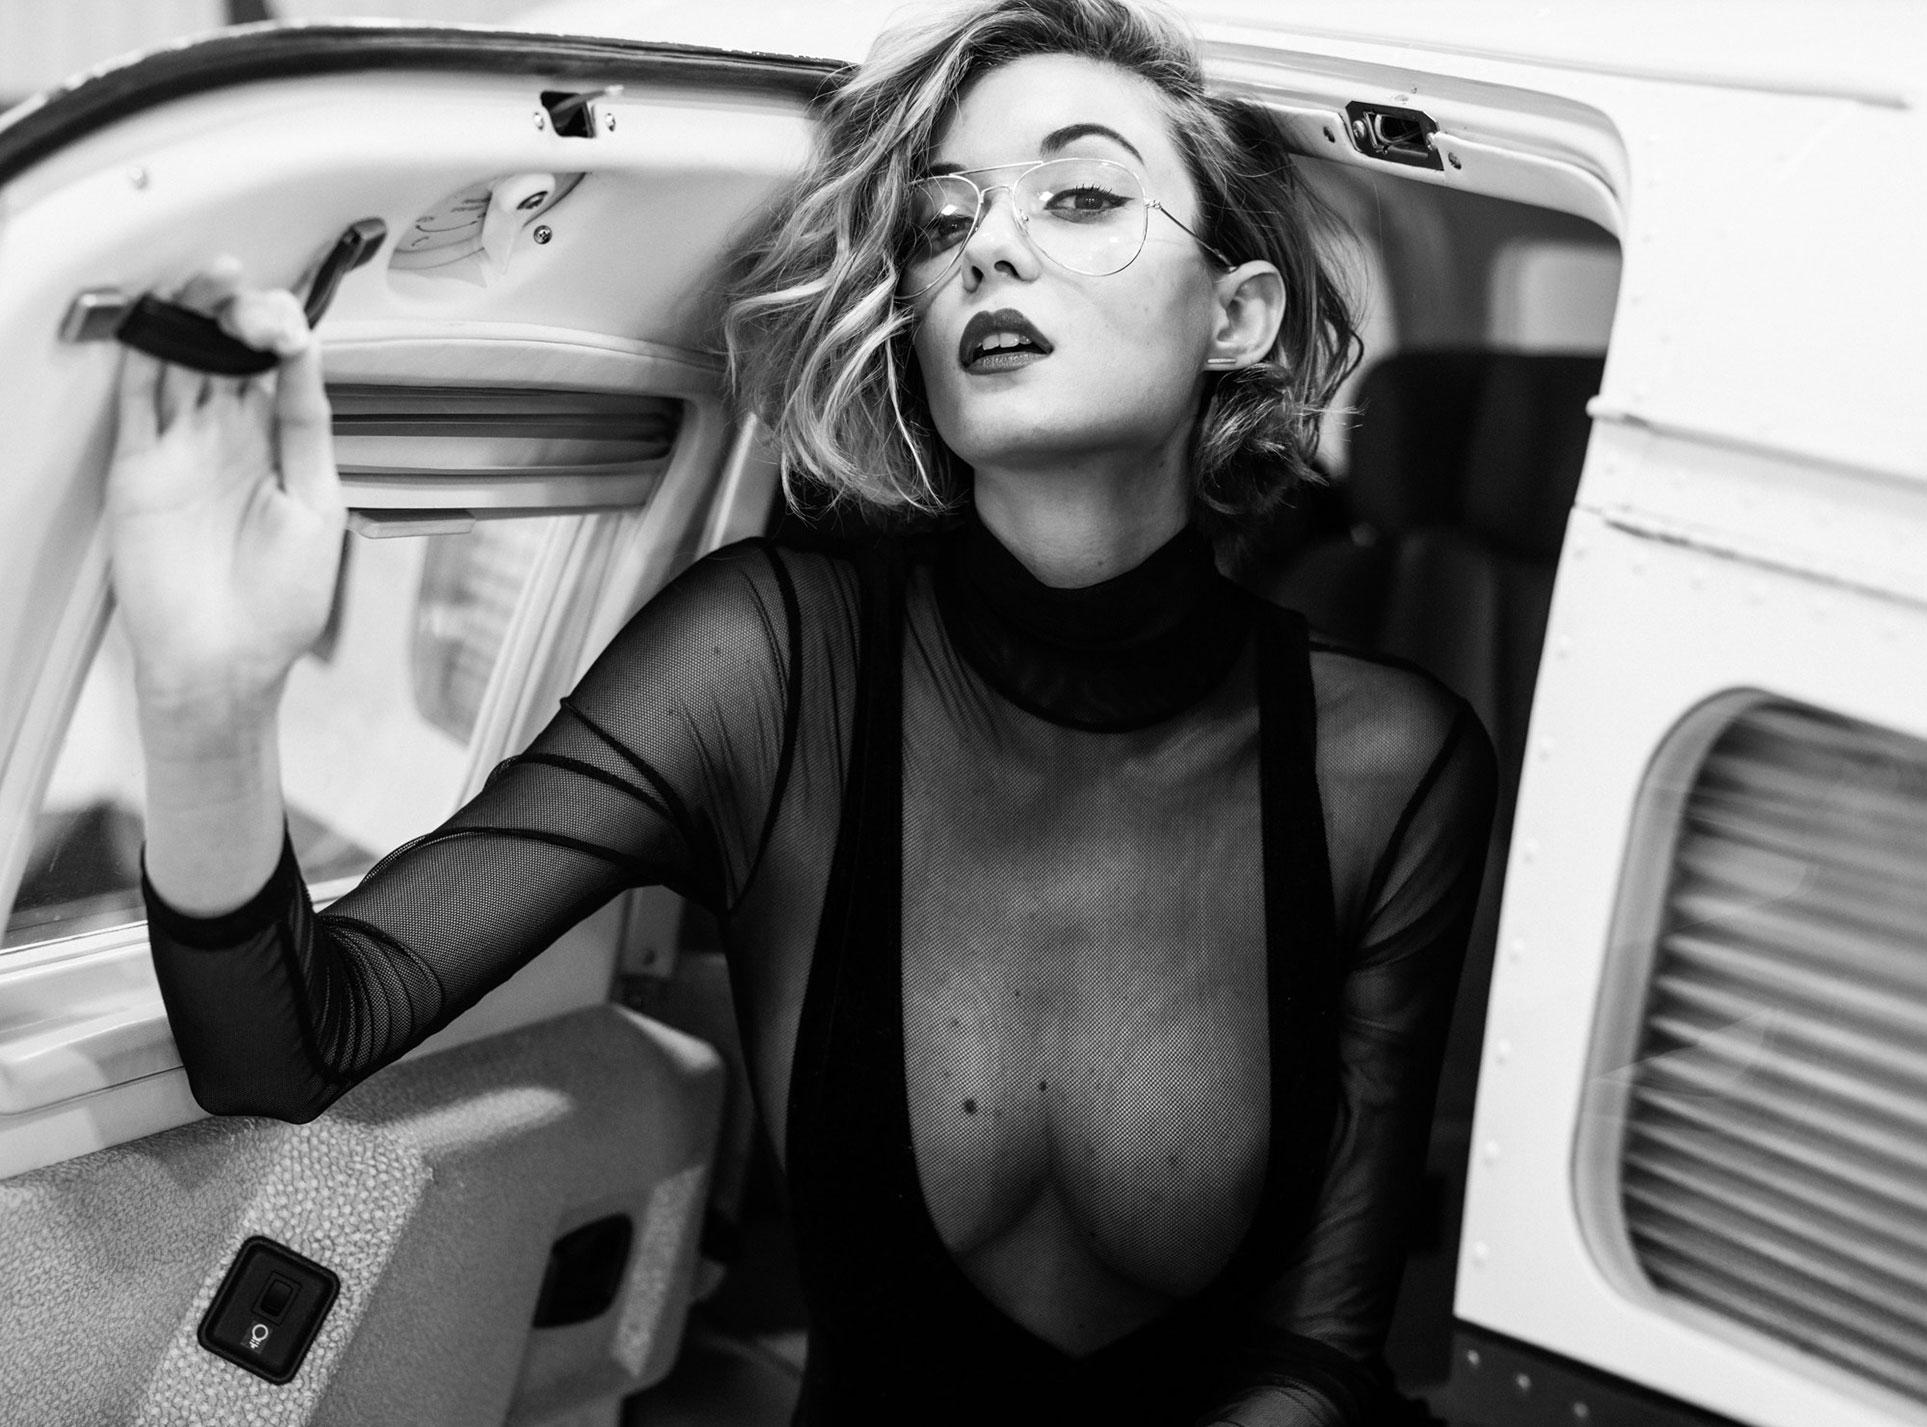 сексуальная угонщица самолета Анна-Лиза / фото 09